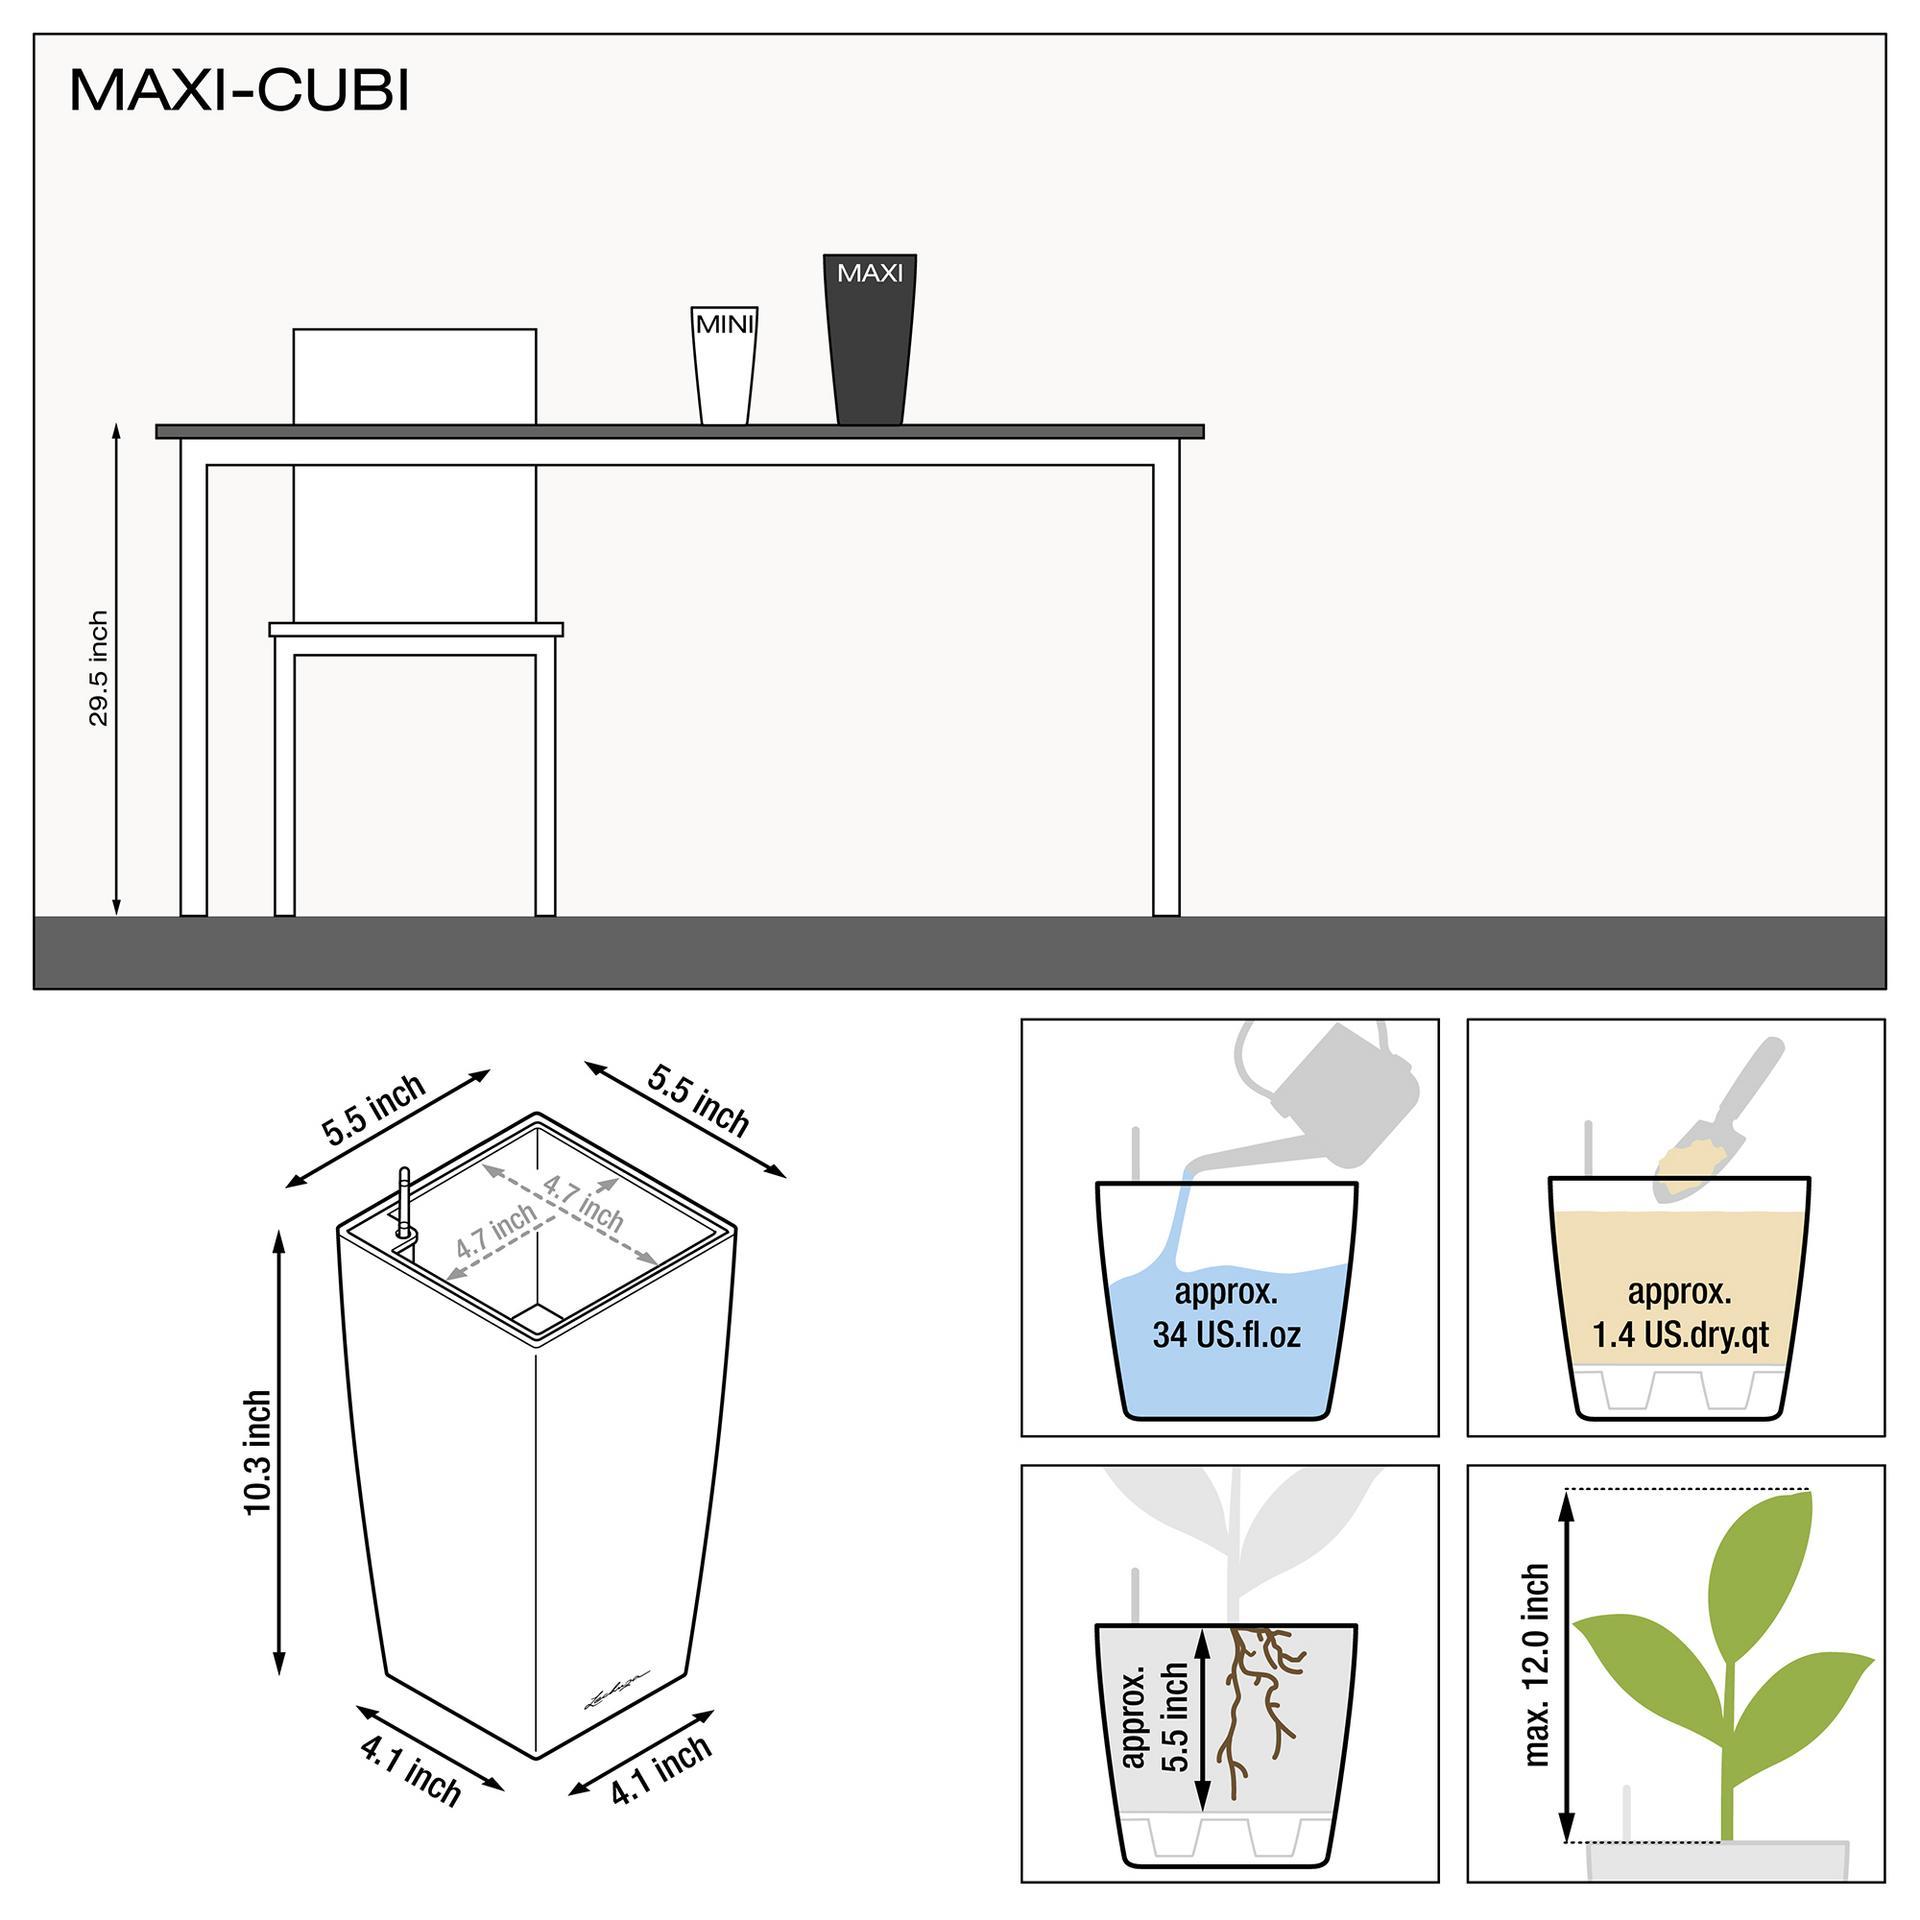 le_maxicubi_product_addi_nz_us